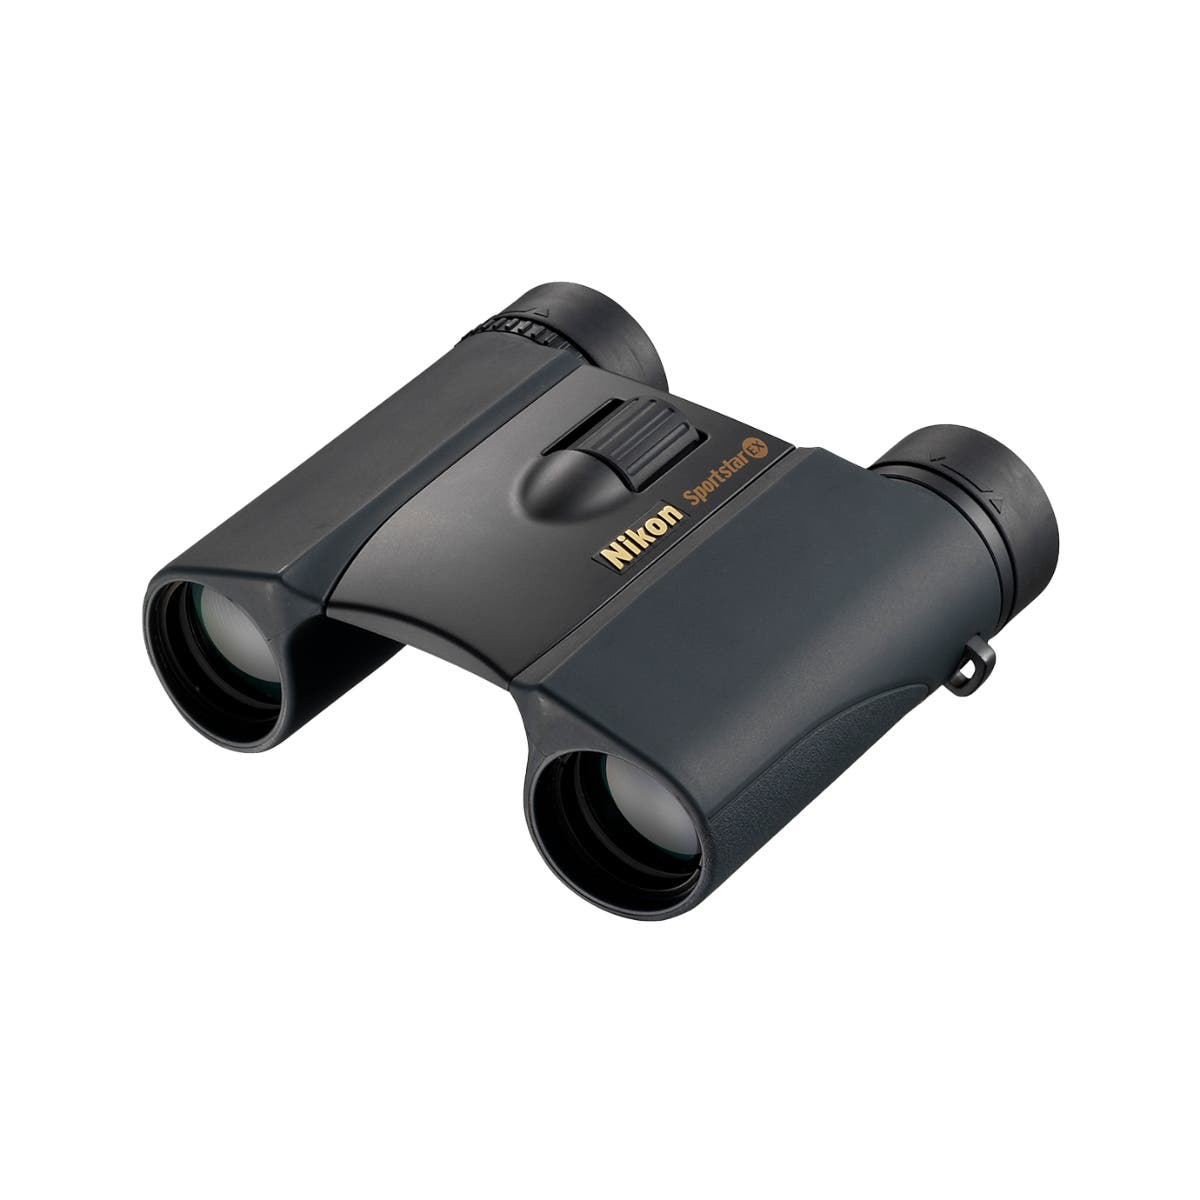 SPORTSTAR EX 10x25 D CF (Charcoal Grey)